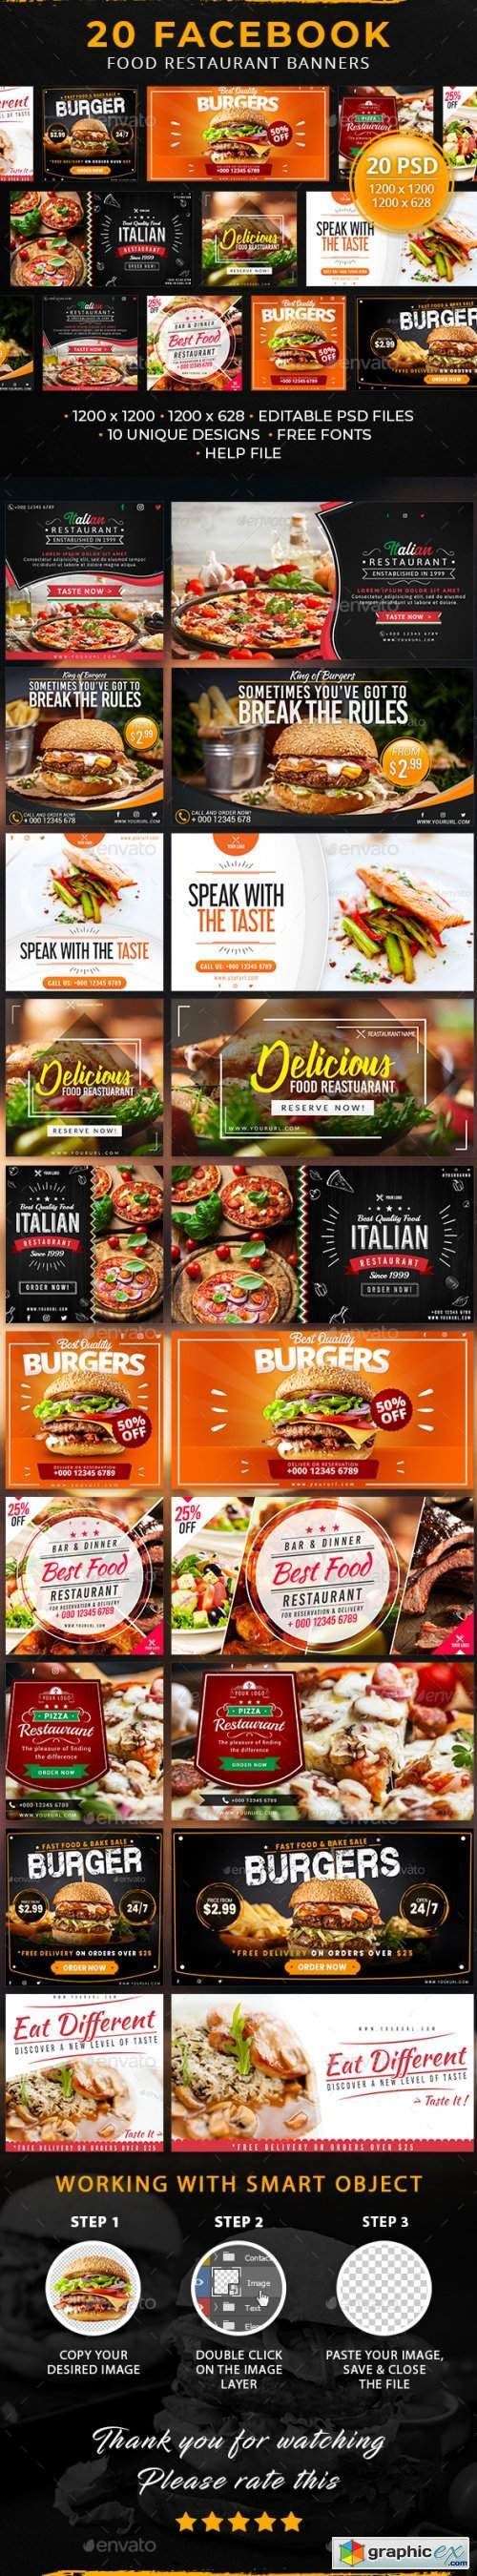 20 Facebook Food Restaurant Banners